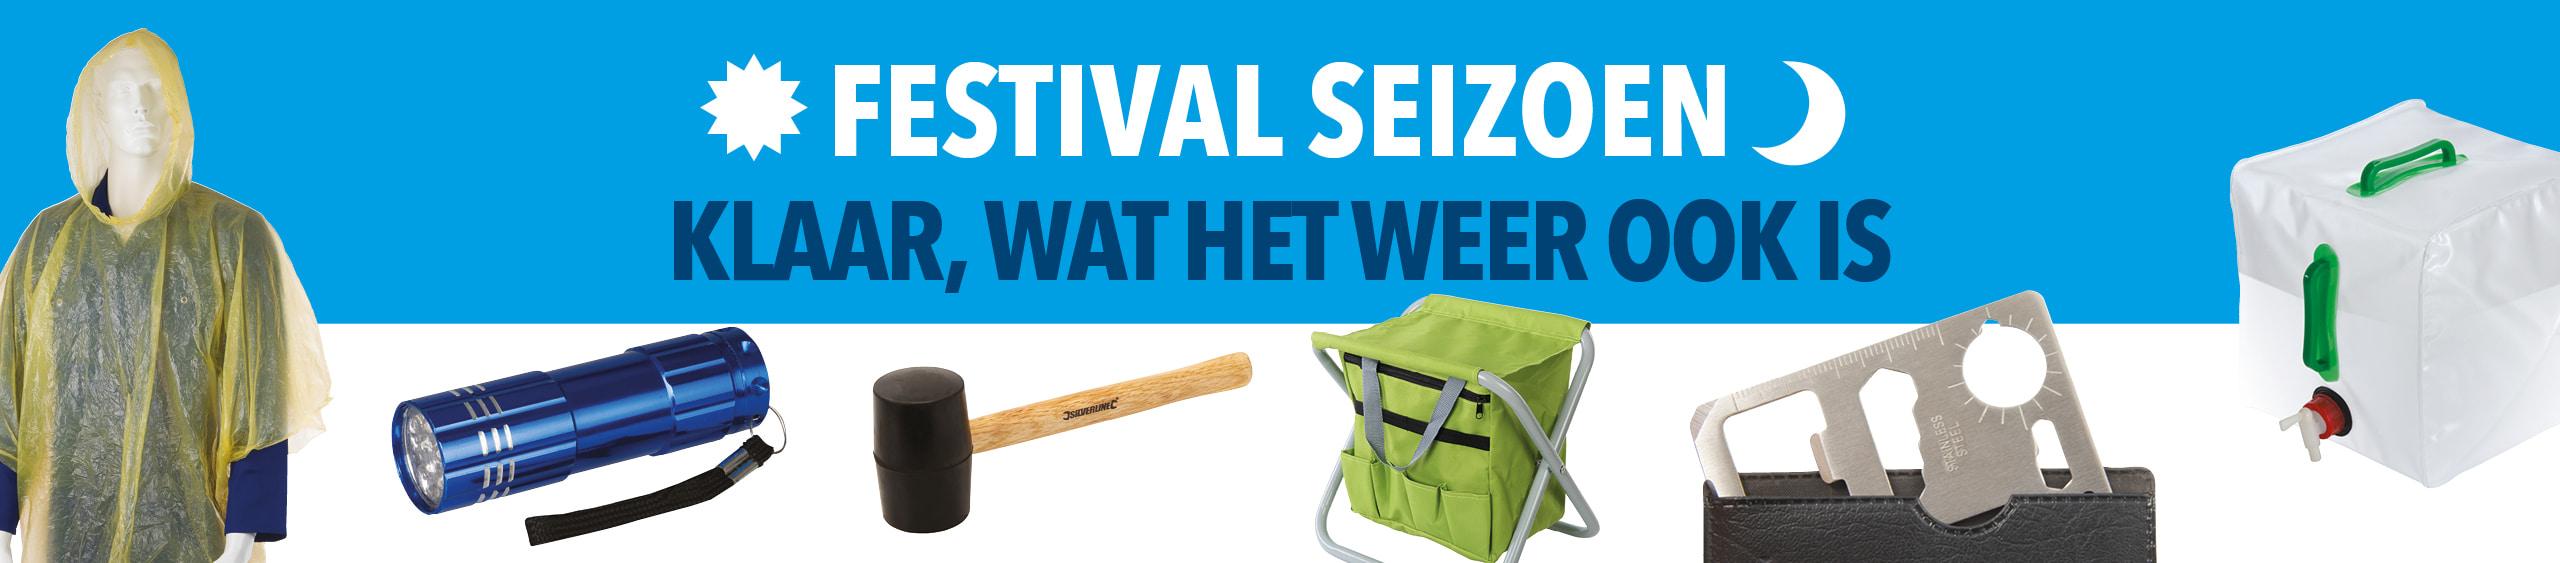 SILVERLINE_TOOLS_FESTIVAL_SEASON